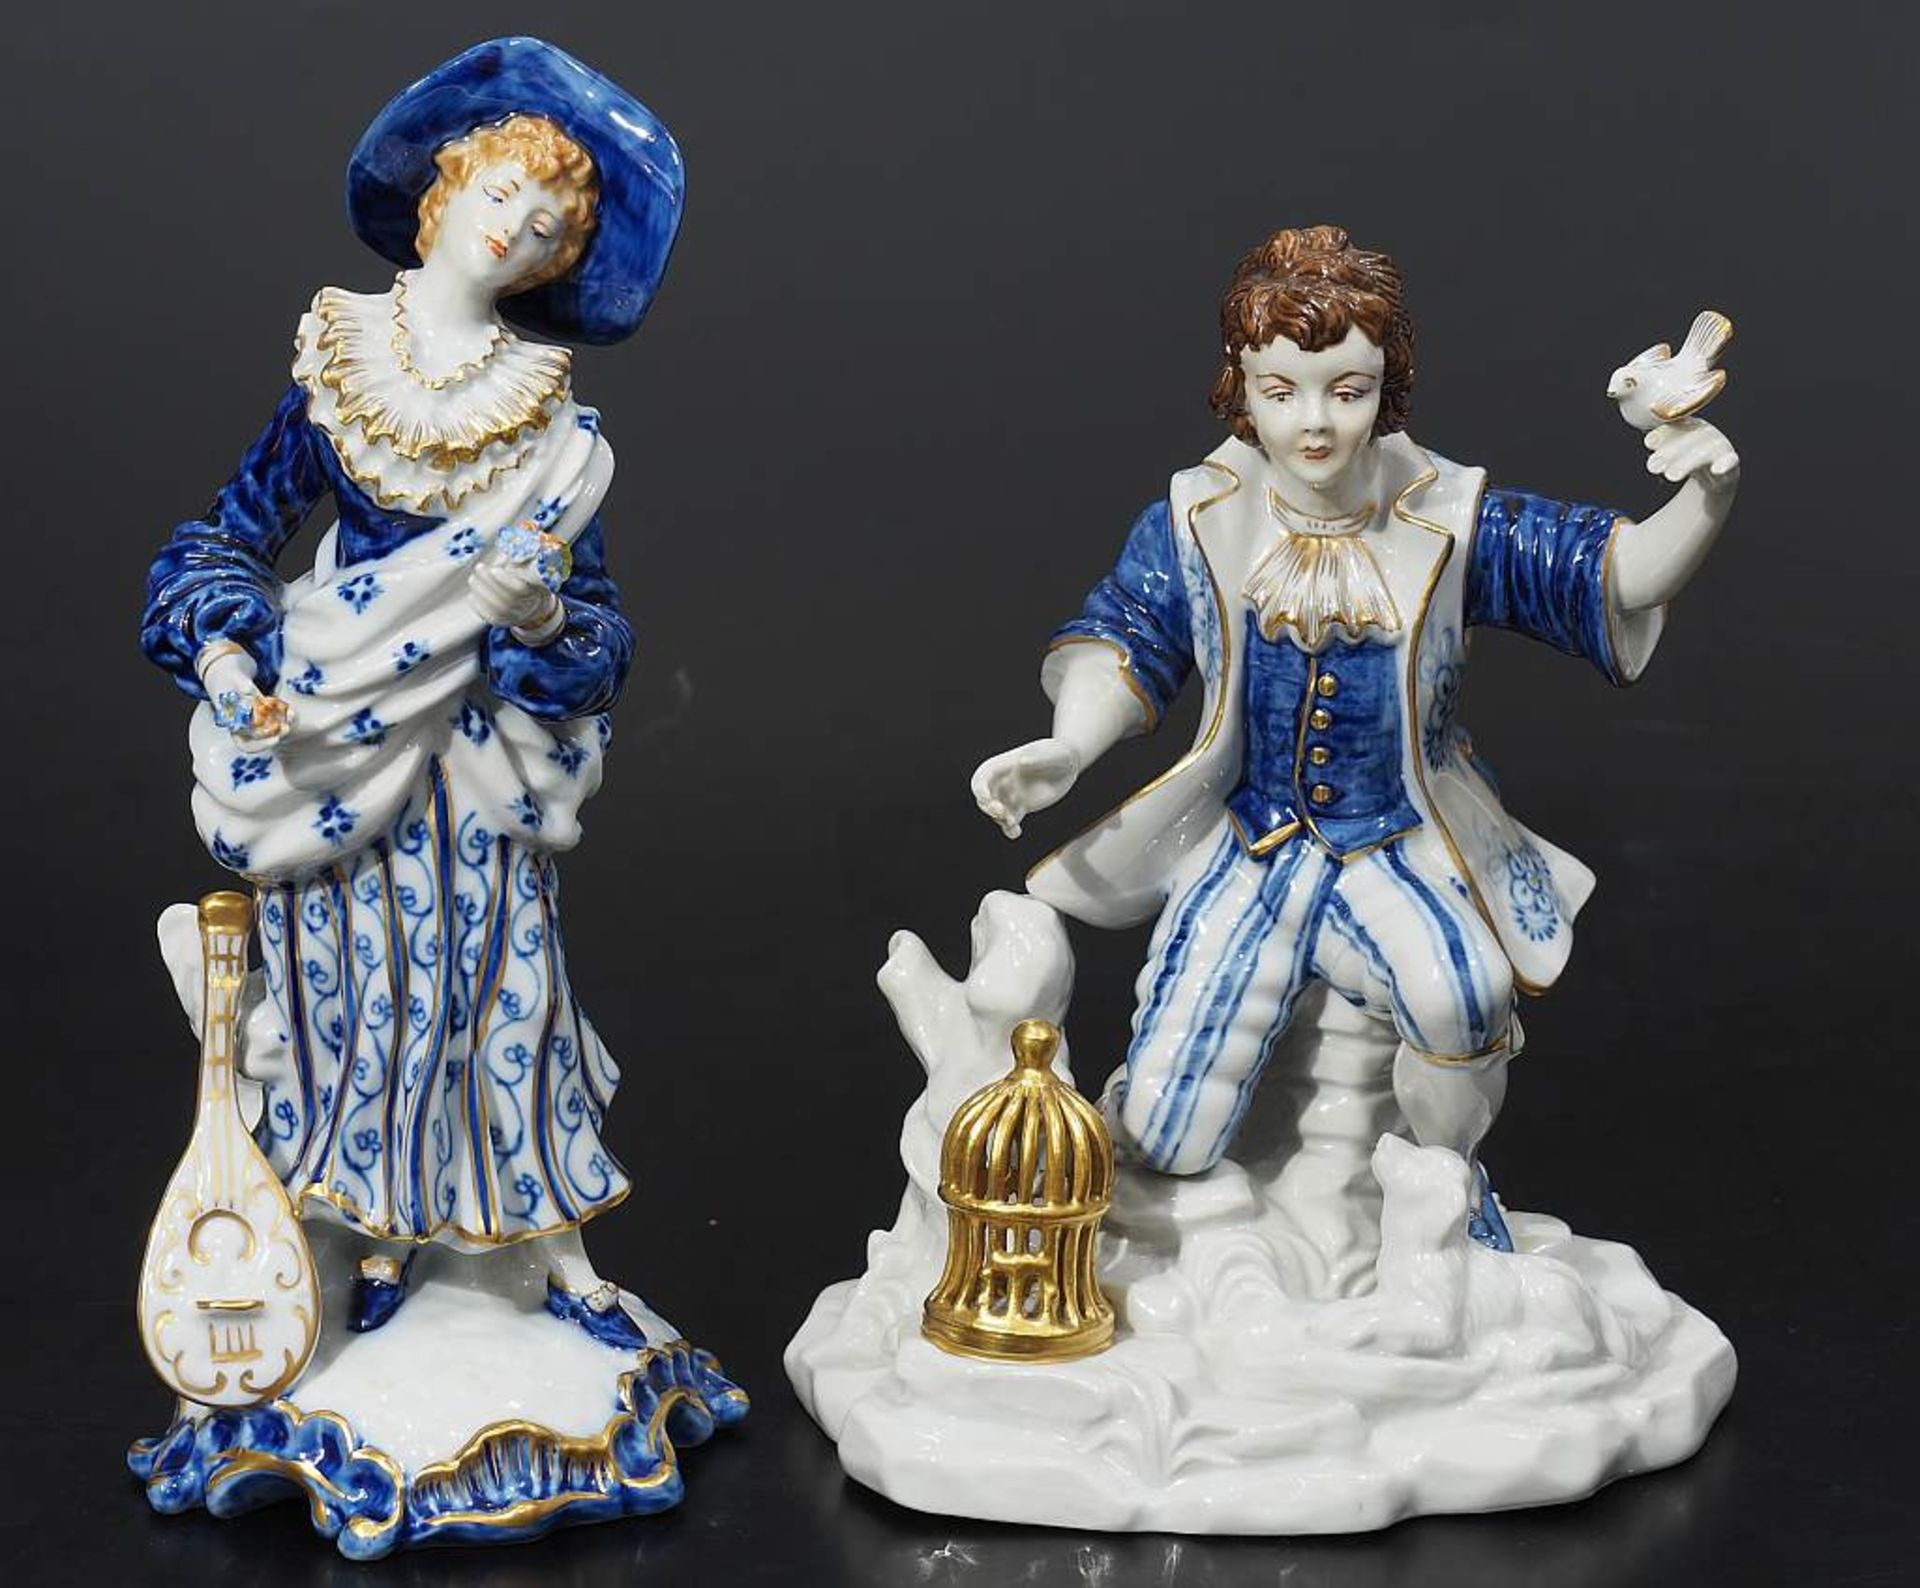 Los 38 - Zwei FigurenZwei Figuren. 1) Figurengruppe Capo-de-Monte, Knabe auf Felssockel, auf seiner linken